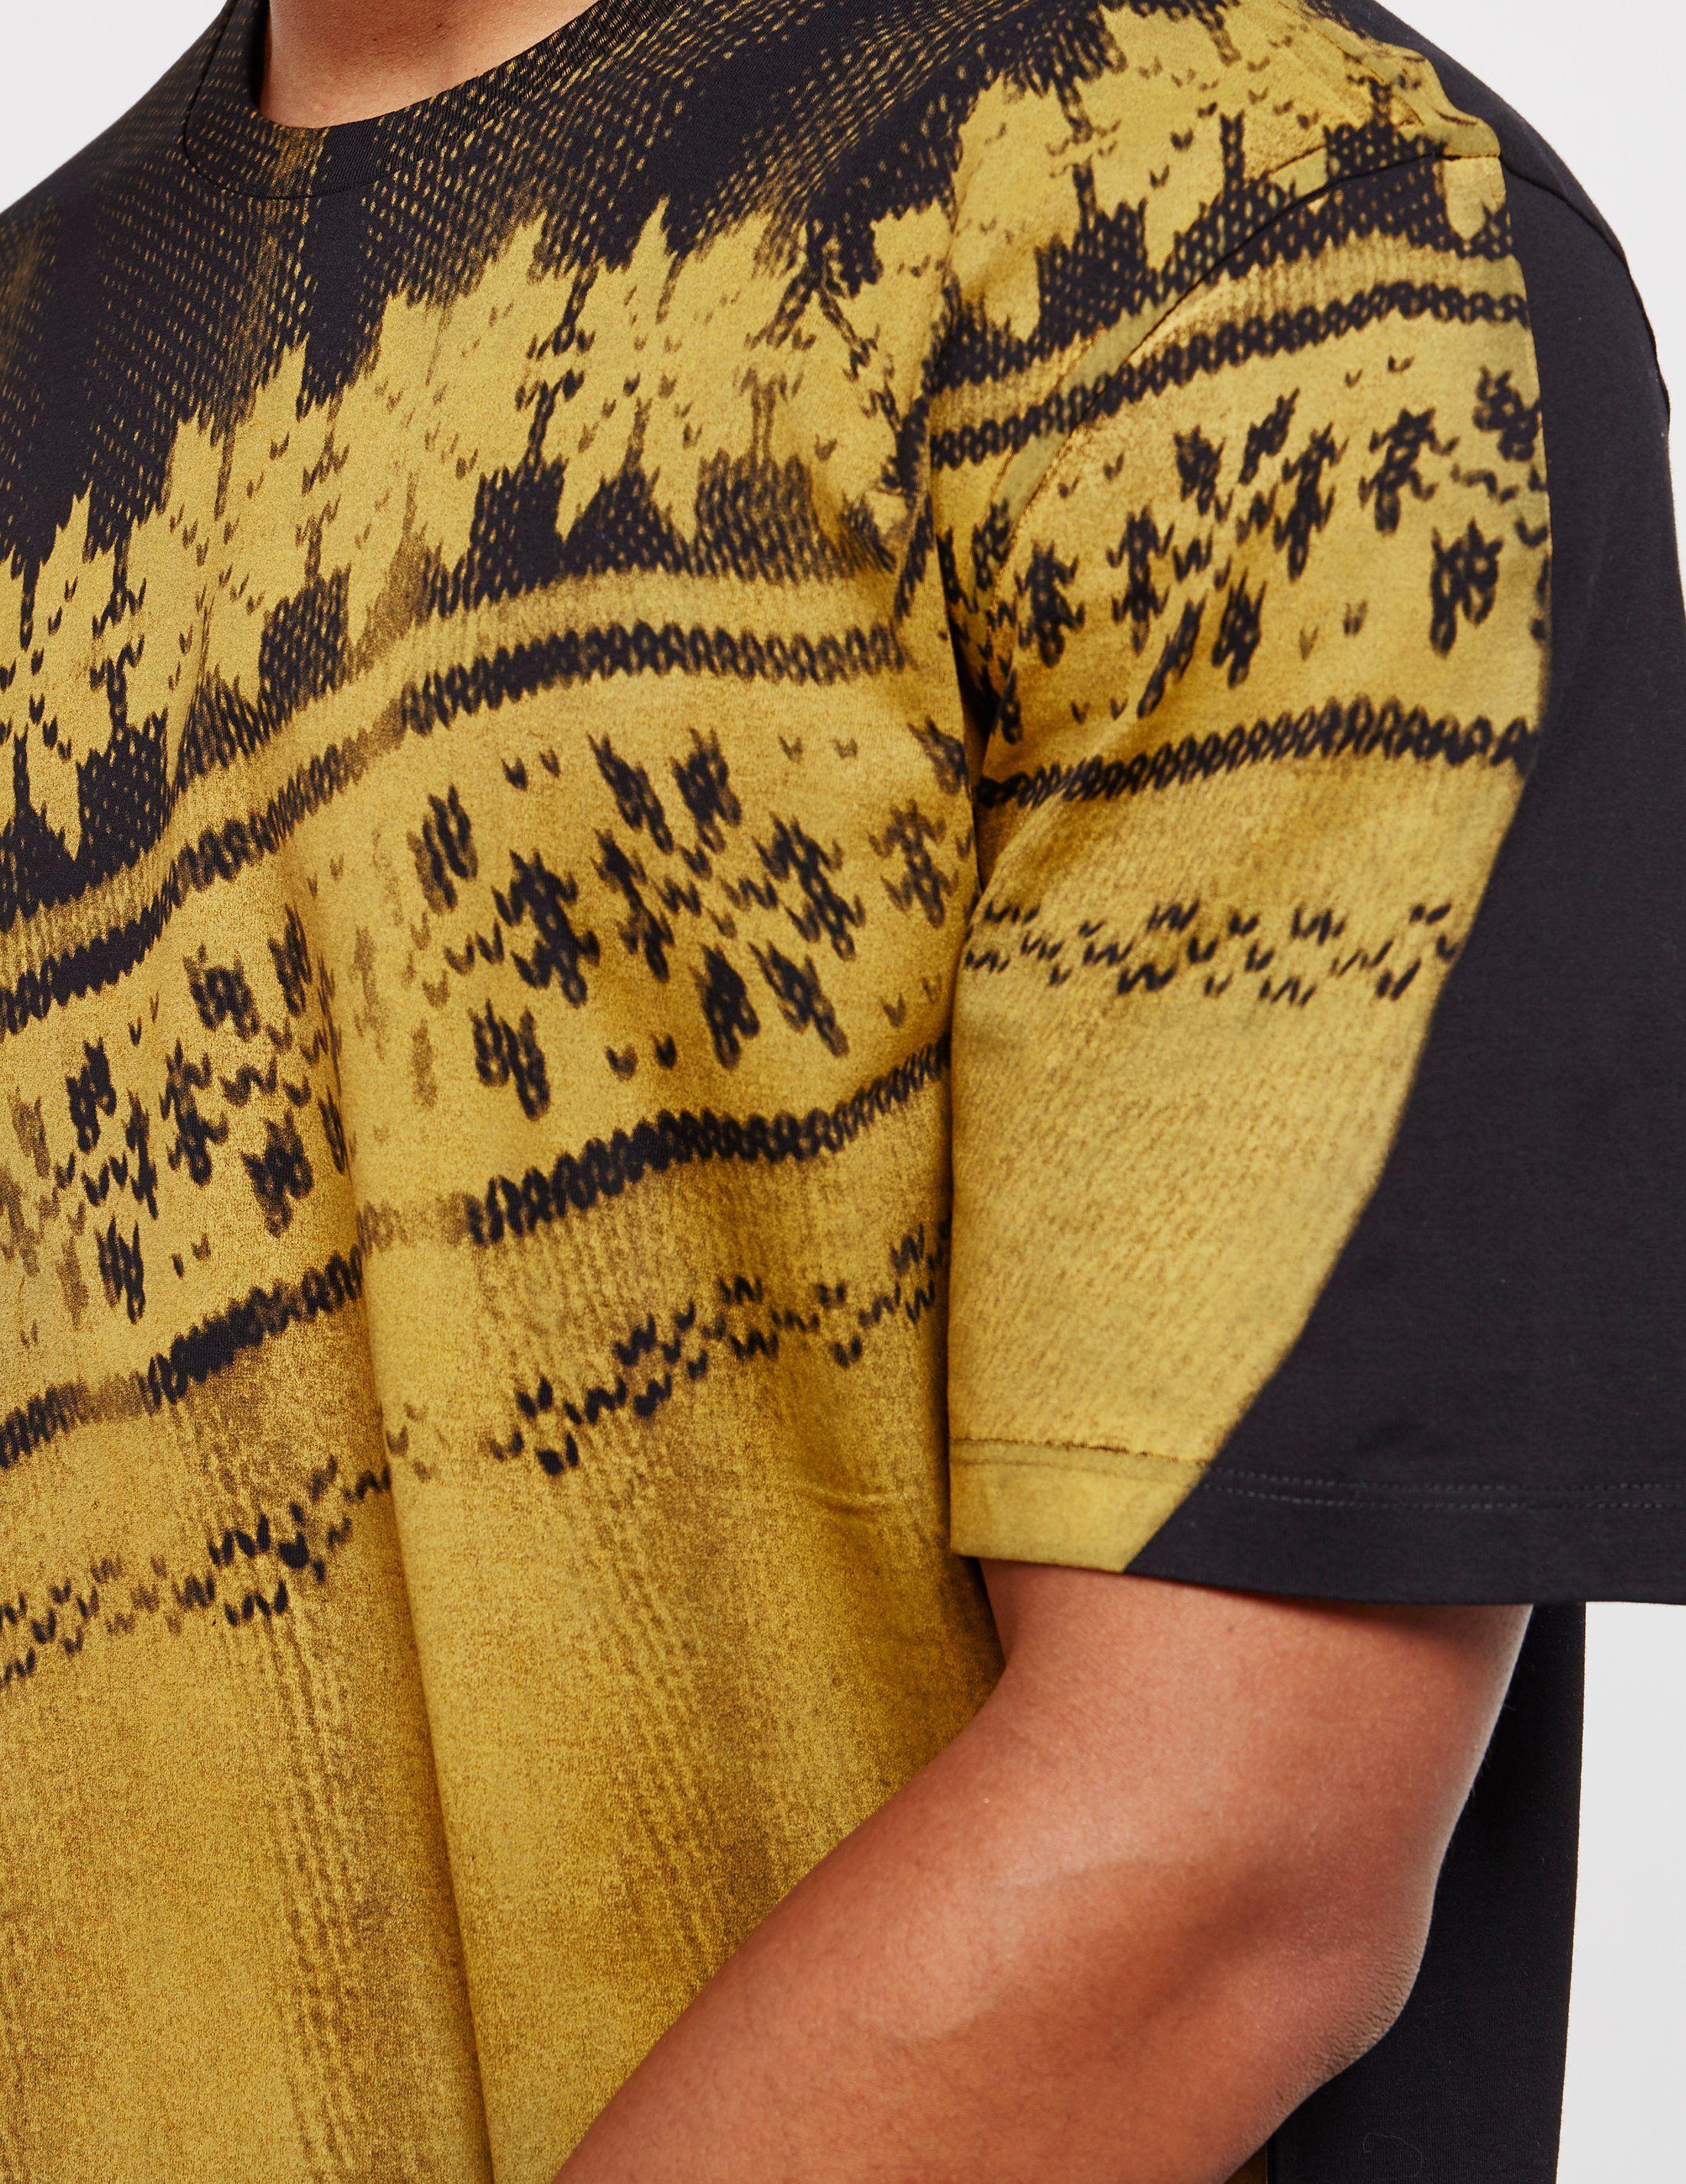 Maison Margiela Stitch Short Sleeve T-Shirt - Online Exclusive